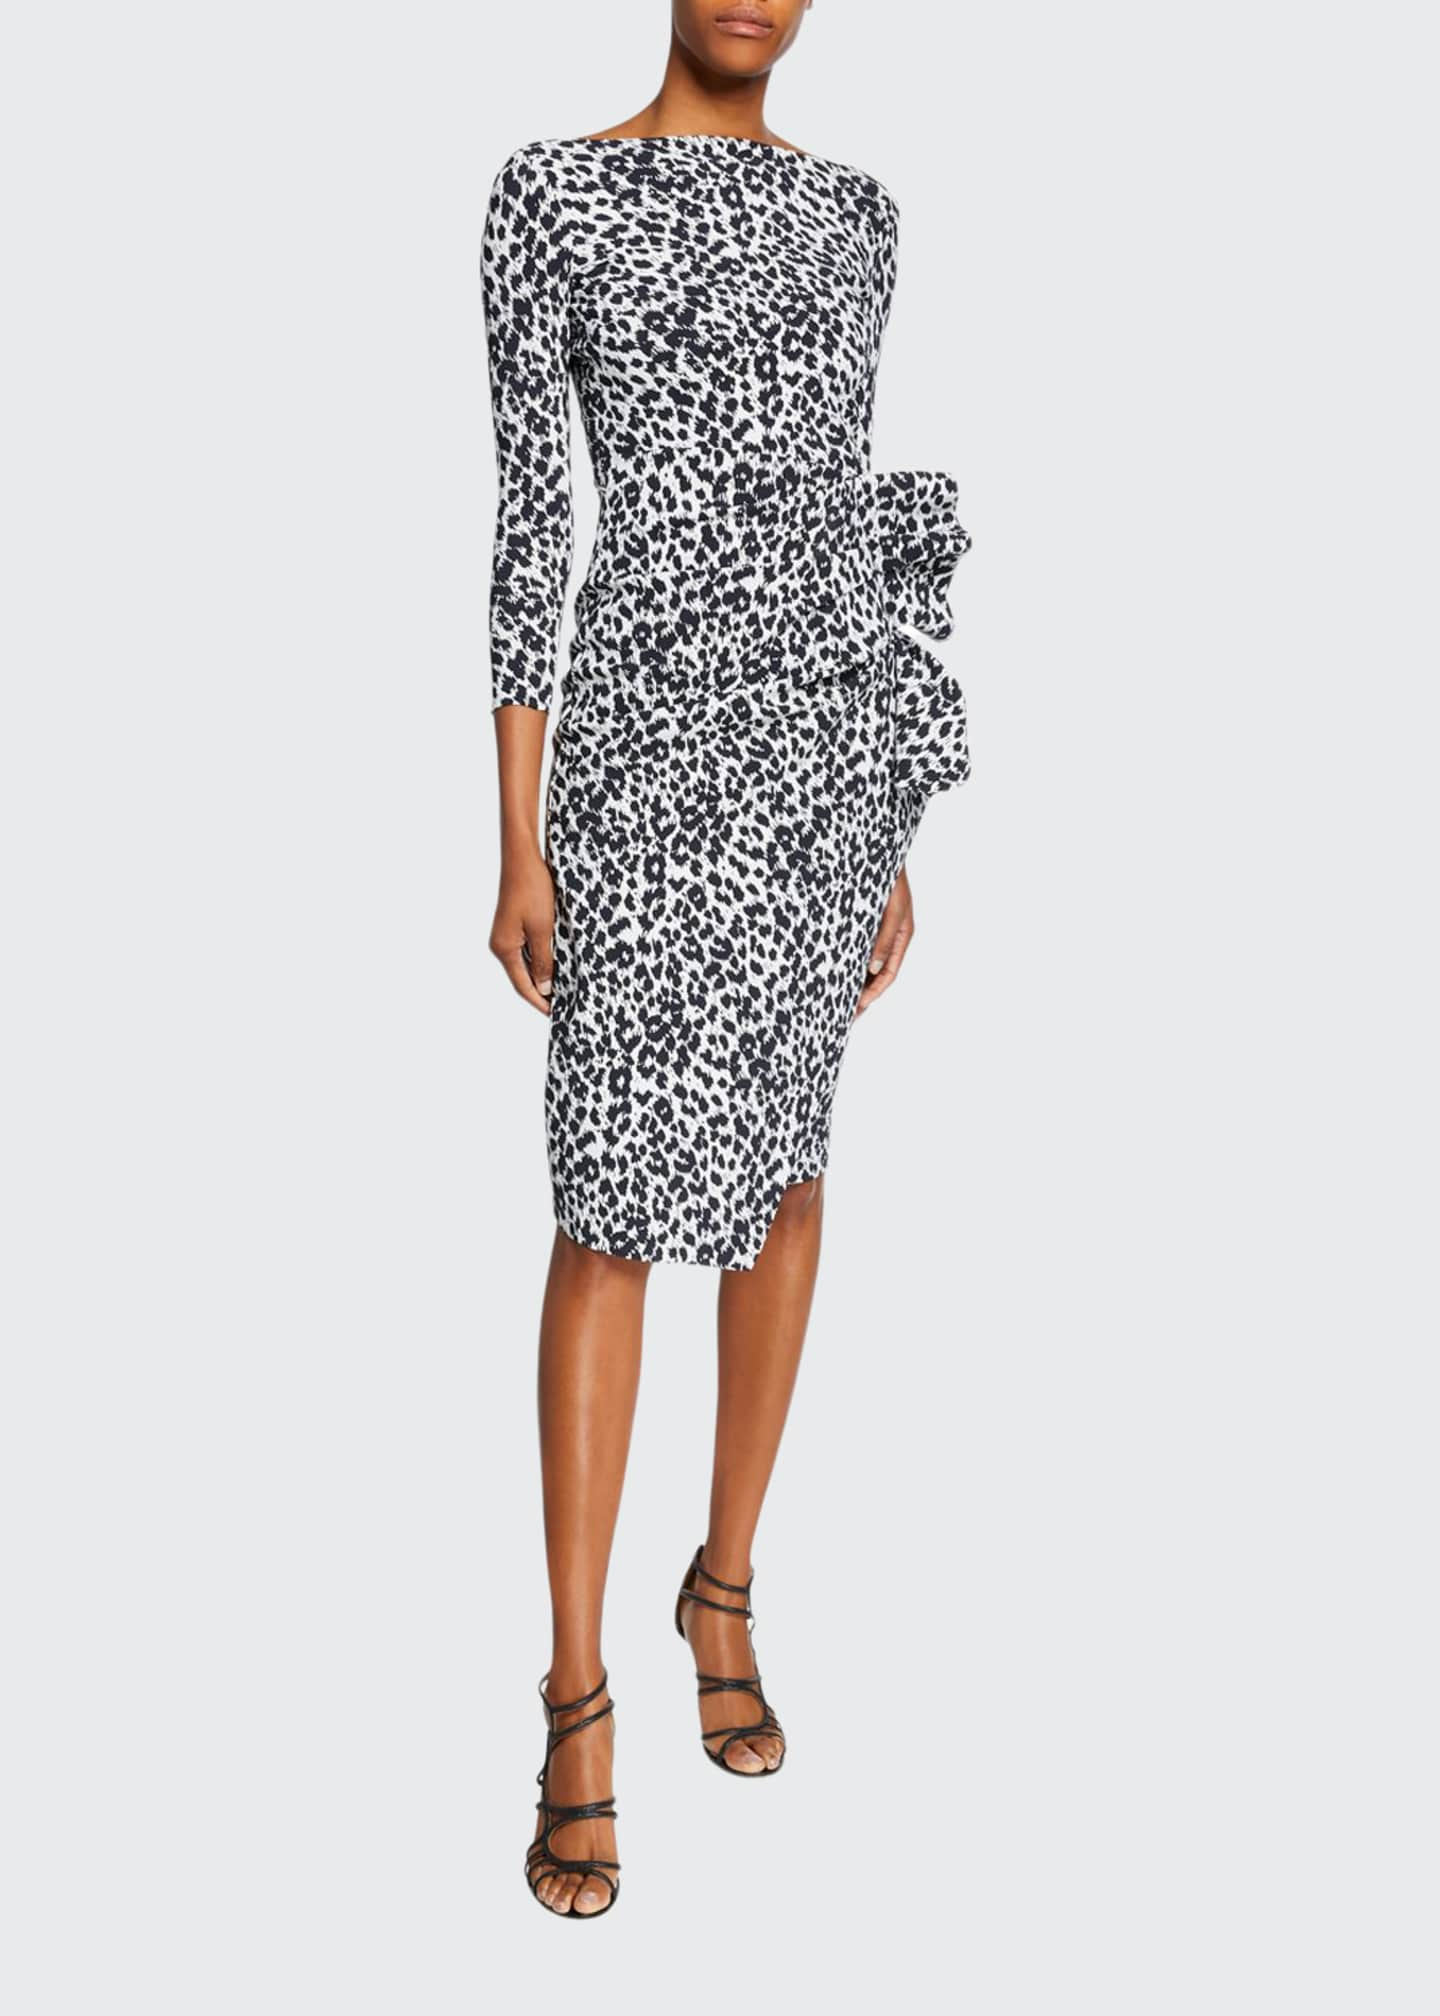 Chiara Boni La Petite Robe Zelma Side-Shirred Printed